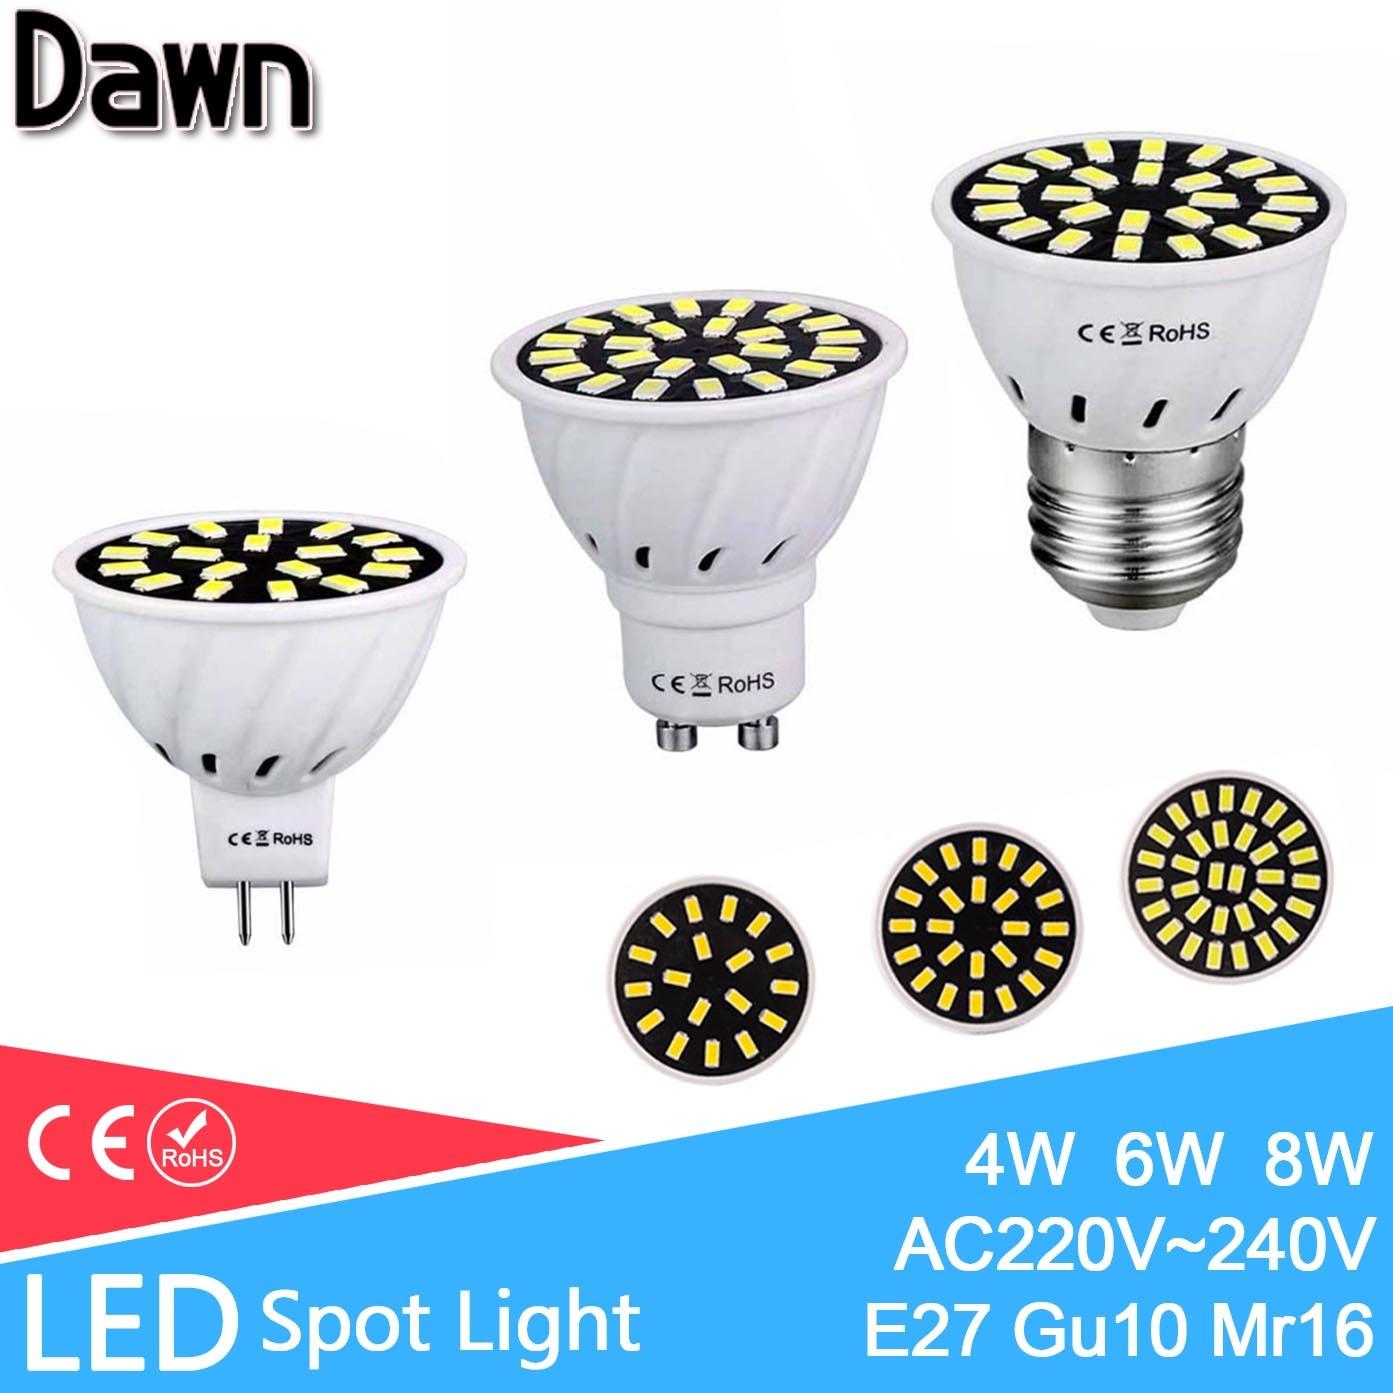 Top-Quality-LED-Spot-Light-4W-6W-8W-Gu10-font-b-Mr16-b-font-font-b Verwunderlich Gu 5.3 Led 230v Dekorationen